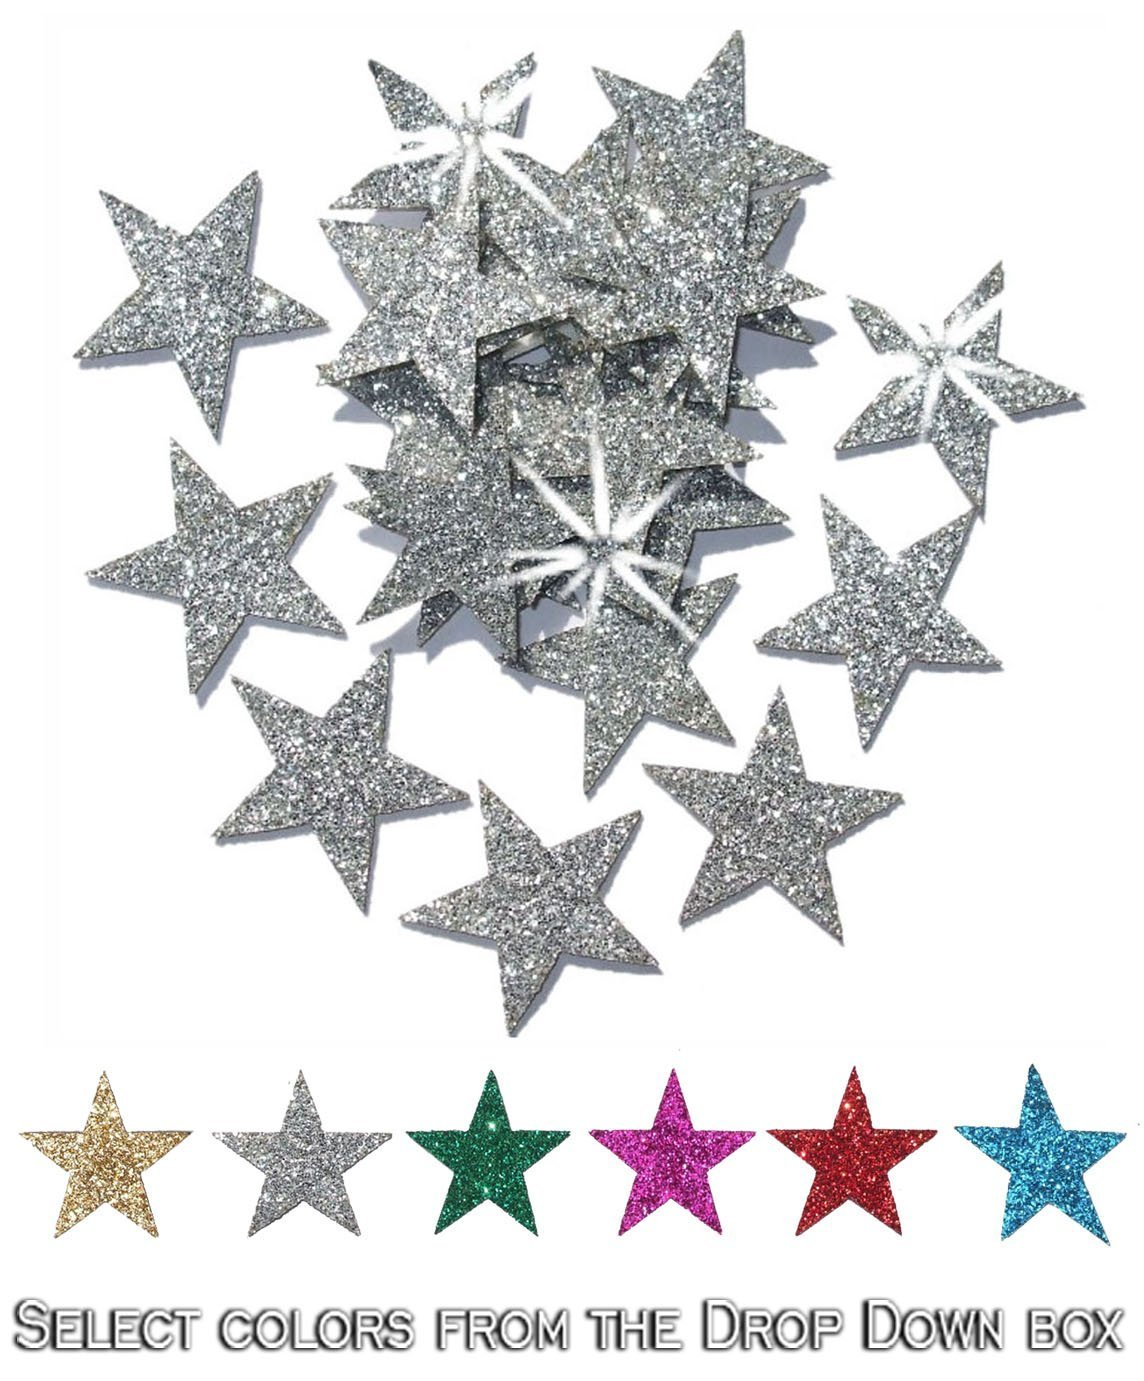 Green 2 Packs = 48 Fabric Glitter 1 Inch 25mm Stars Iron-On Fabric Transfer